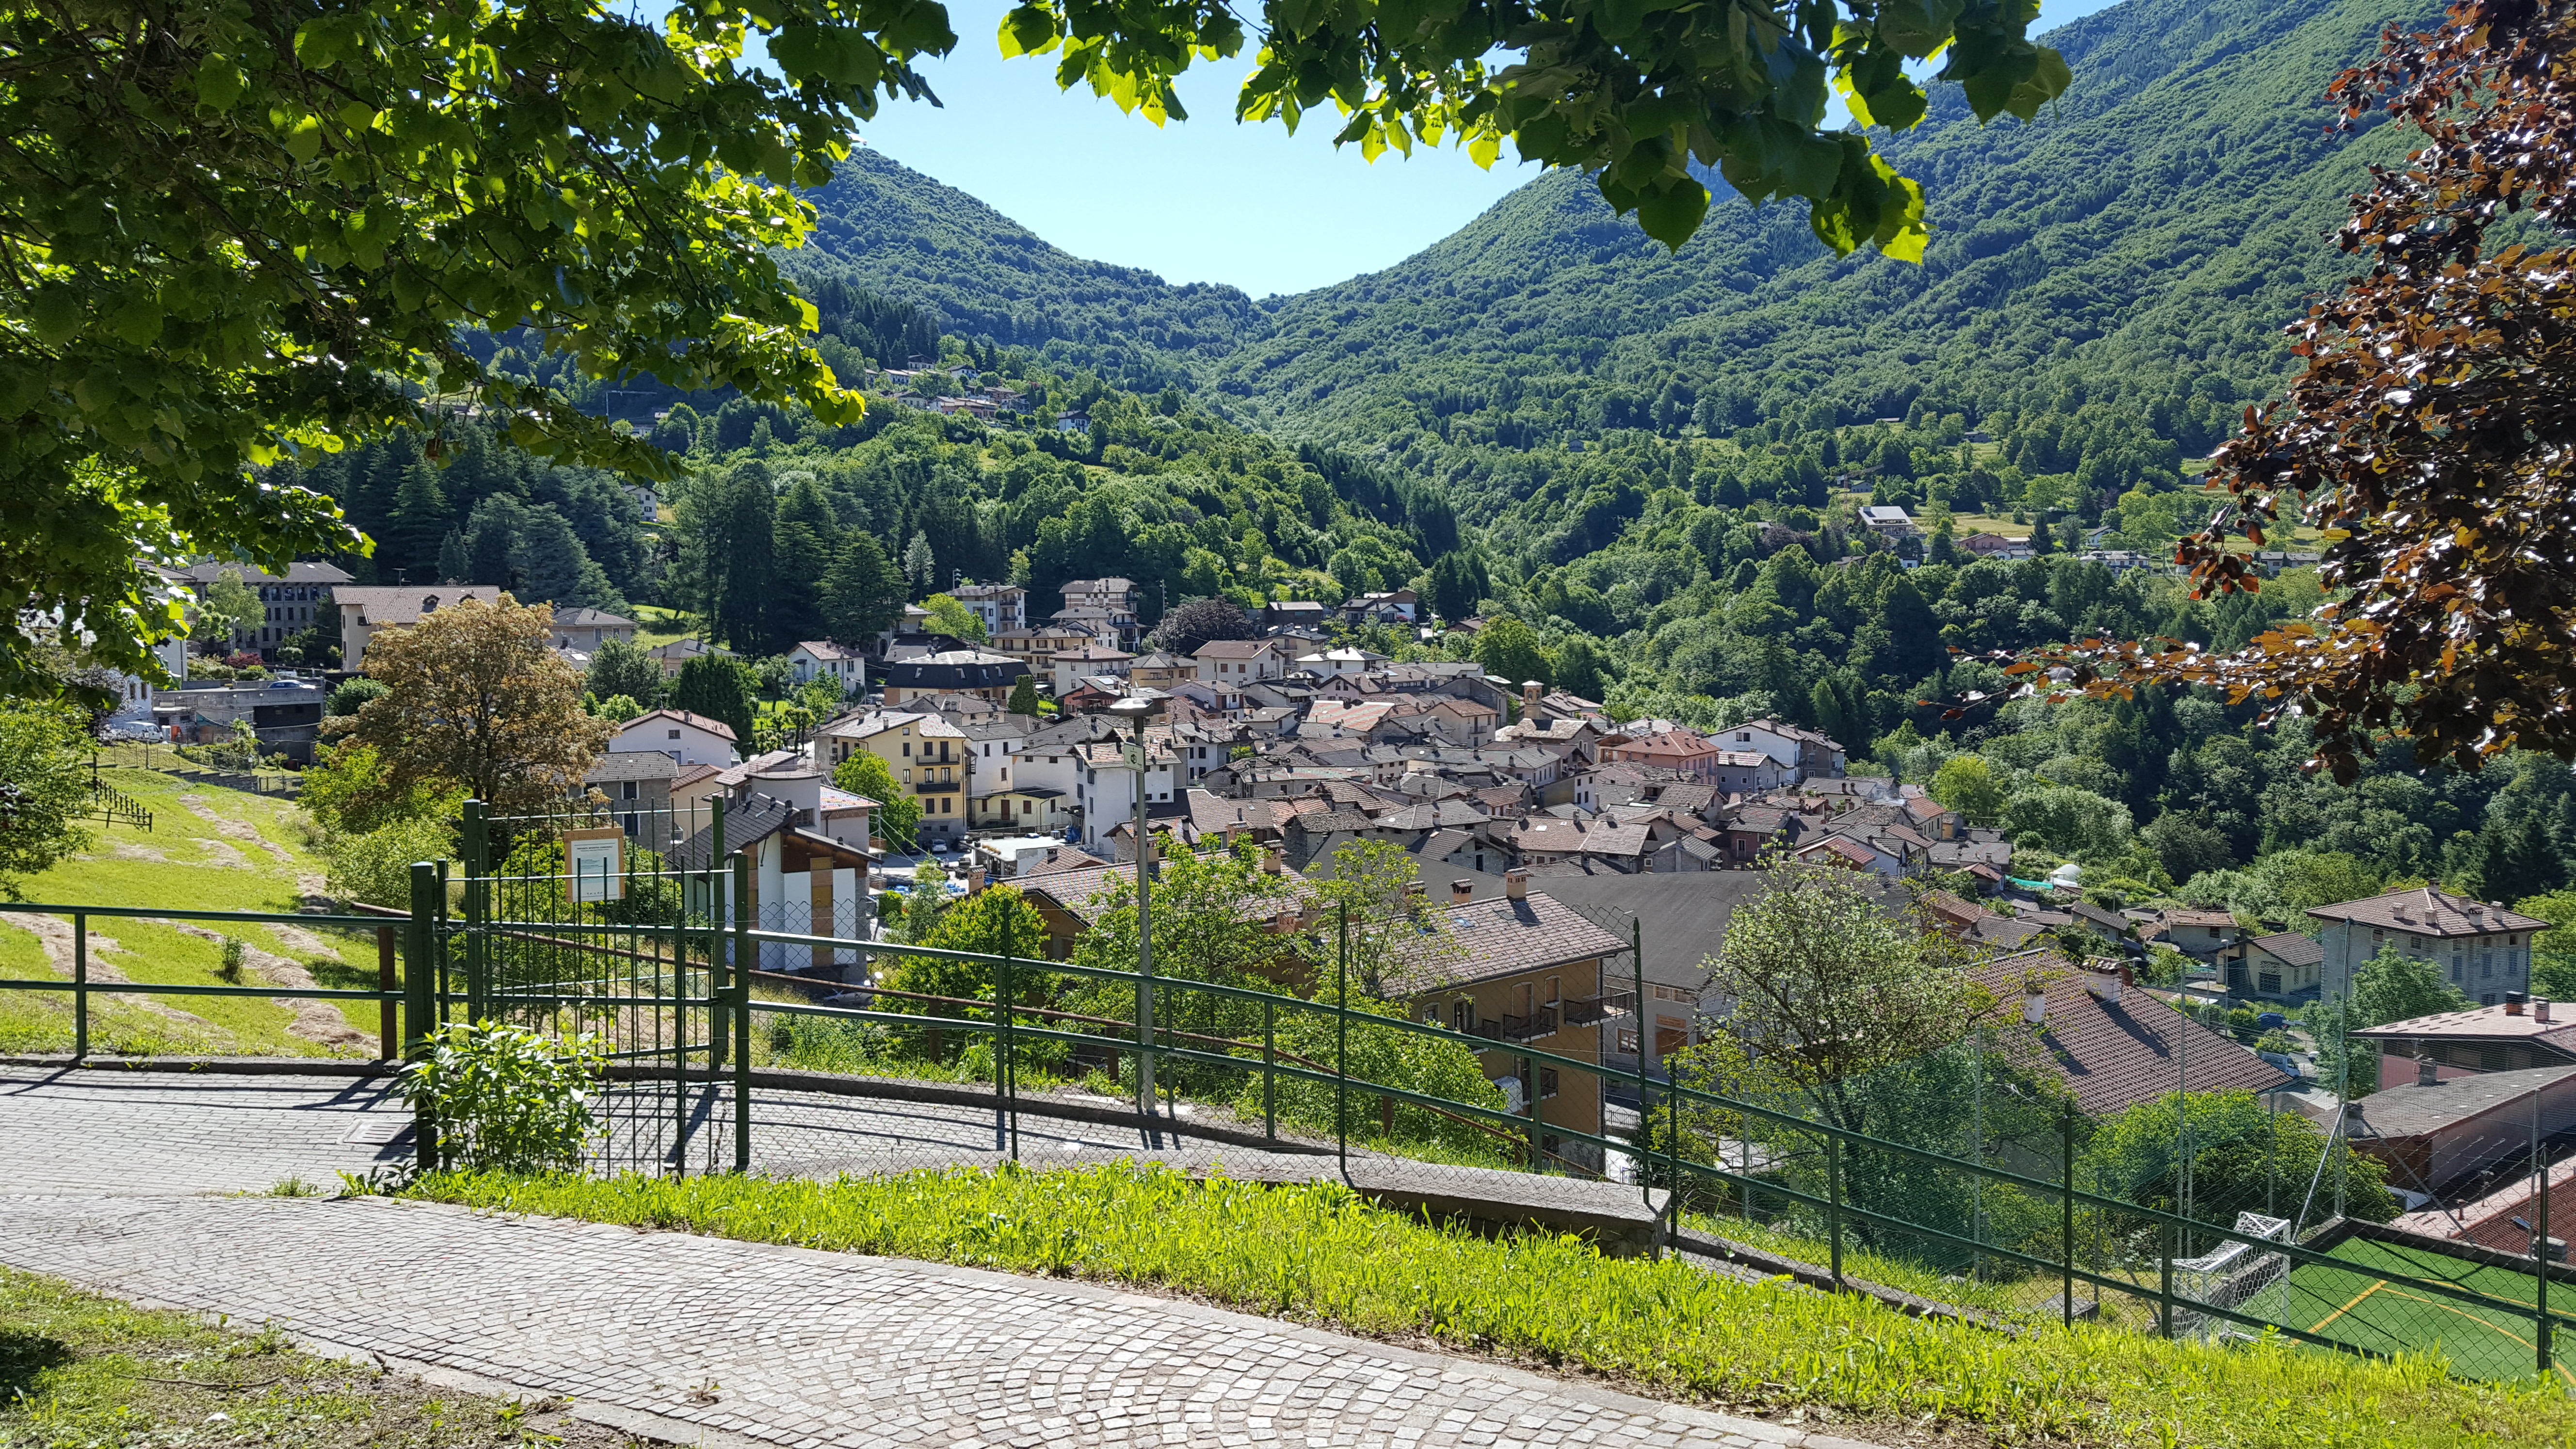 Esino_Lario-View_from_Chiesa_di_San_Vittore_(1)